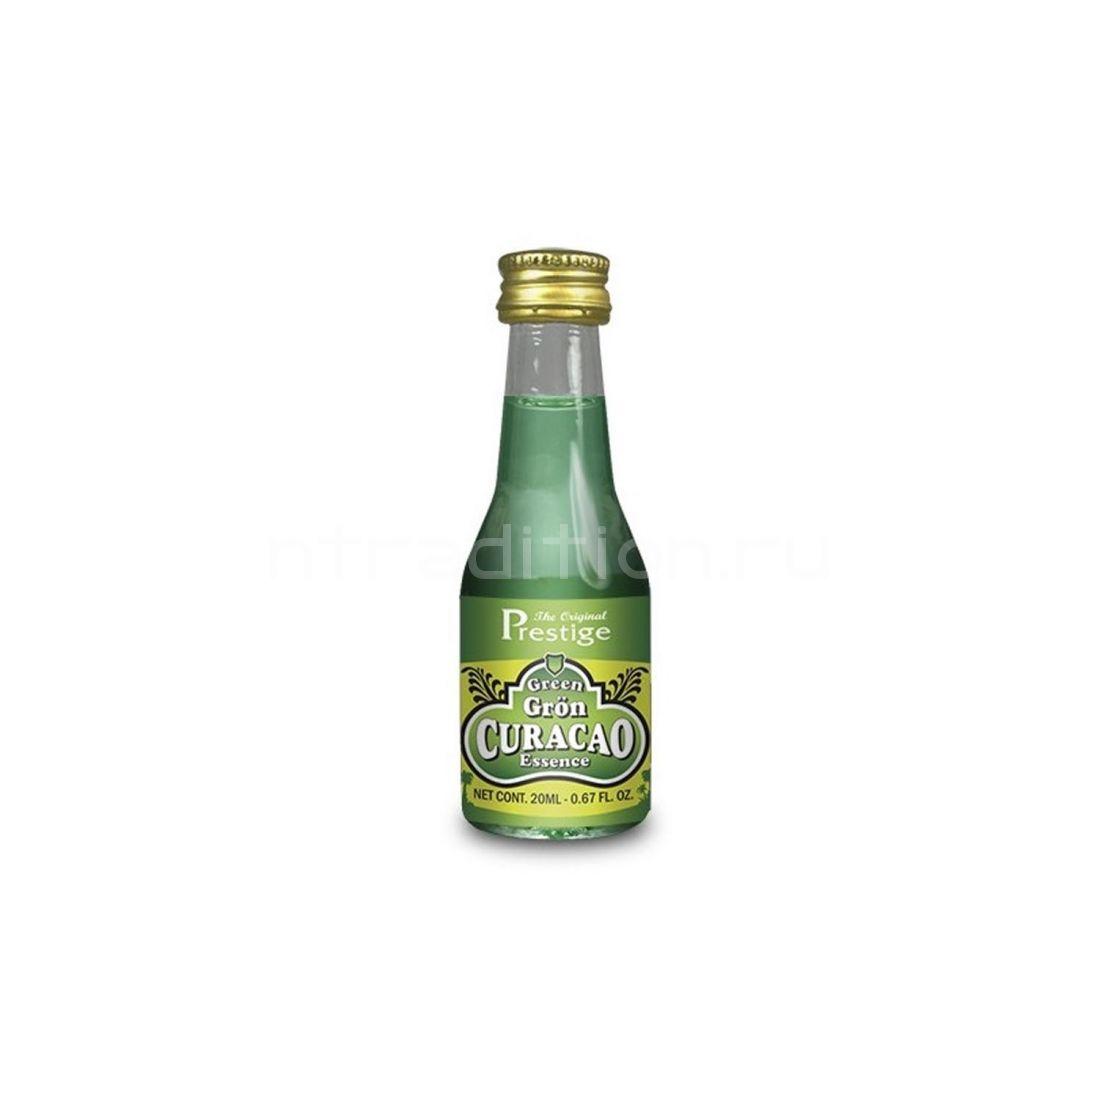 "Curacao Green Essence, 20 мл (эссенция для самогона ""Грин Кюрасао"")"